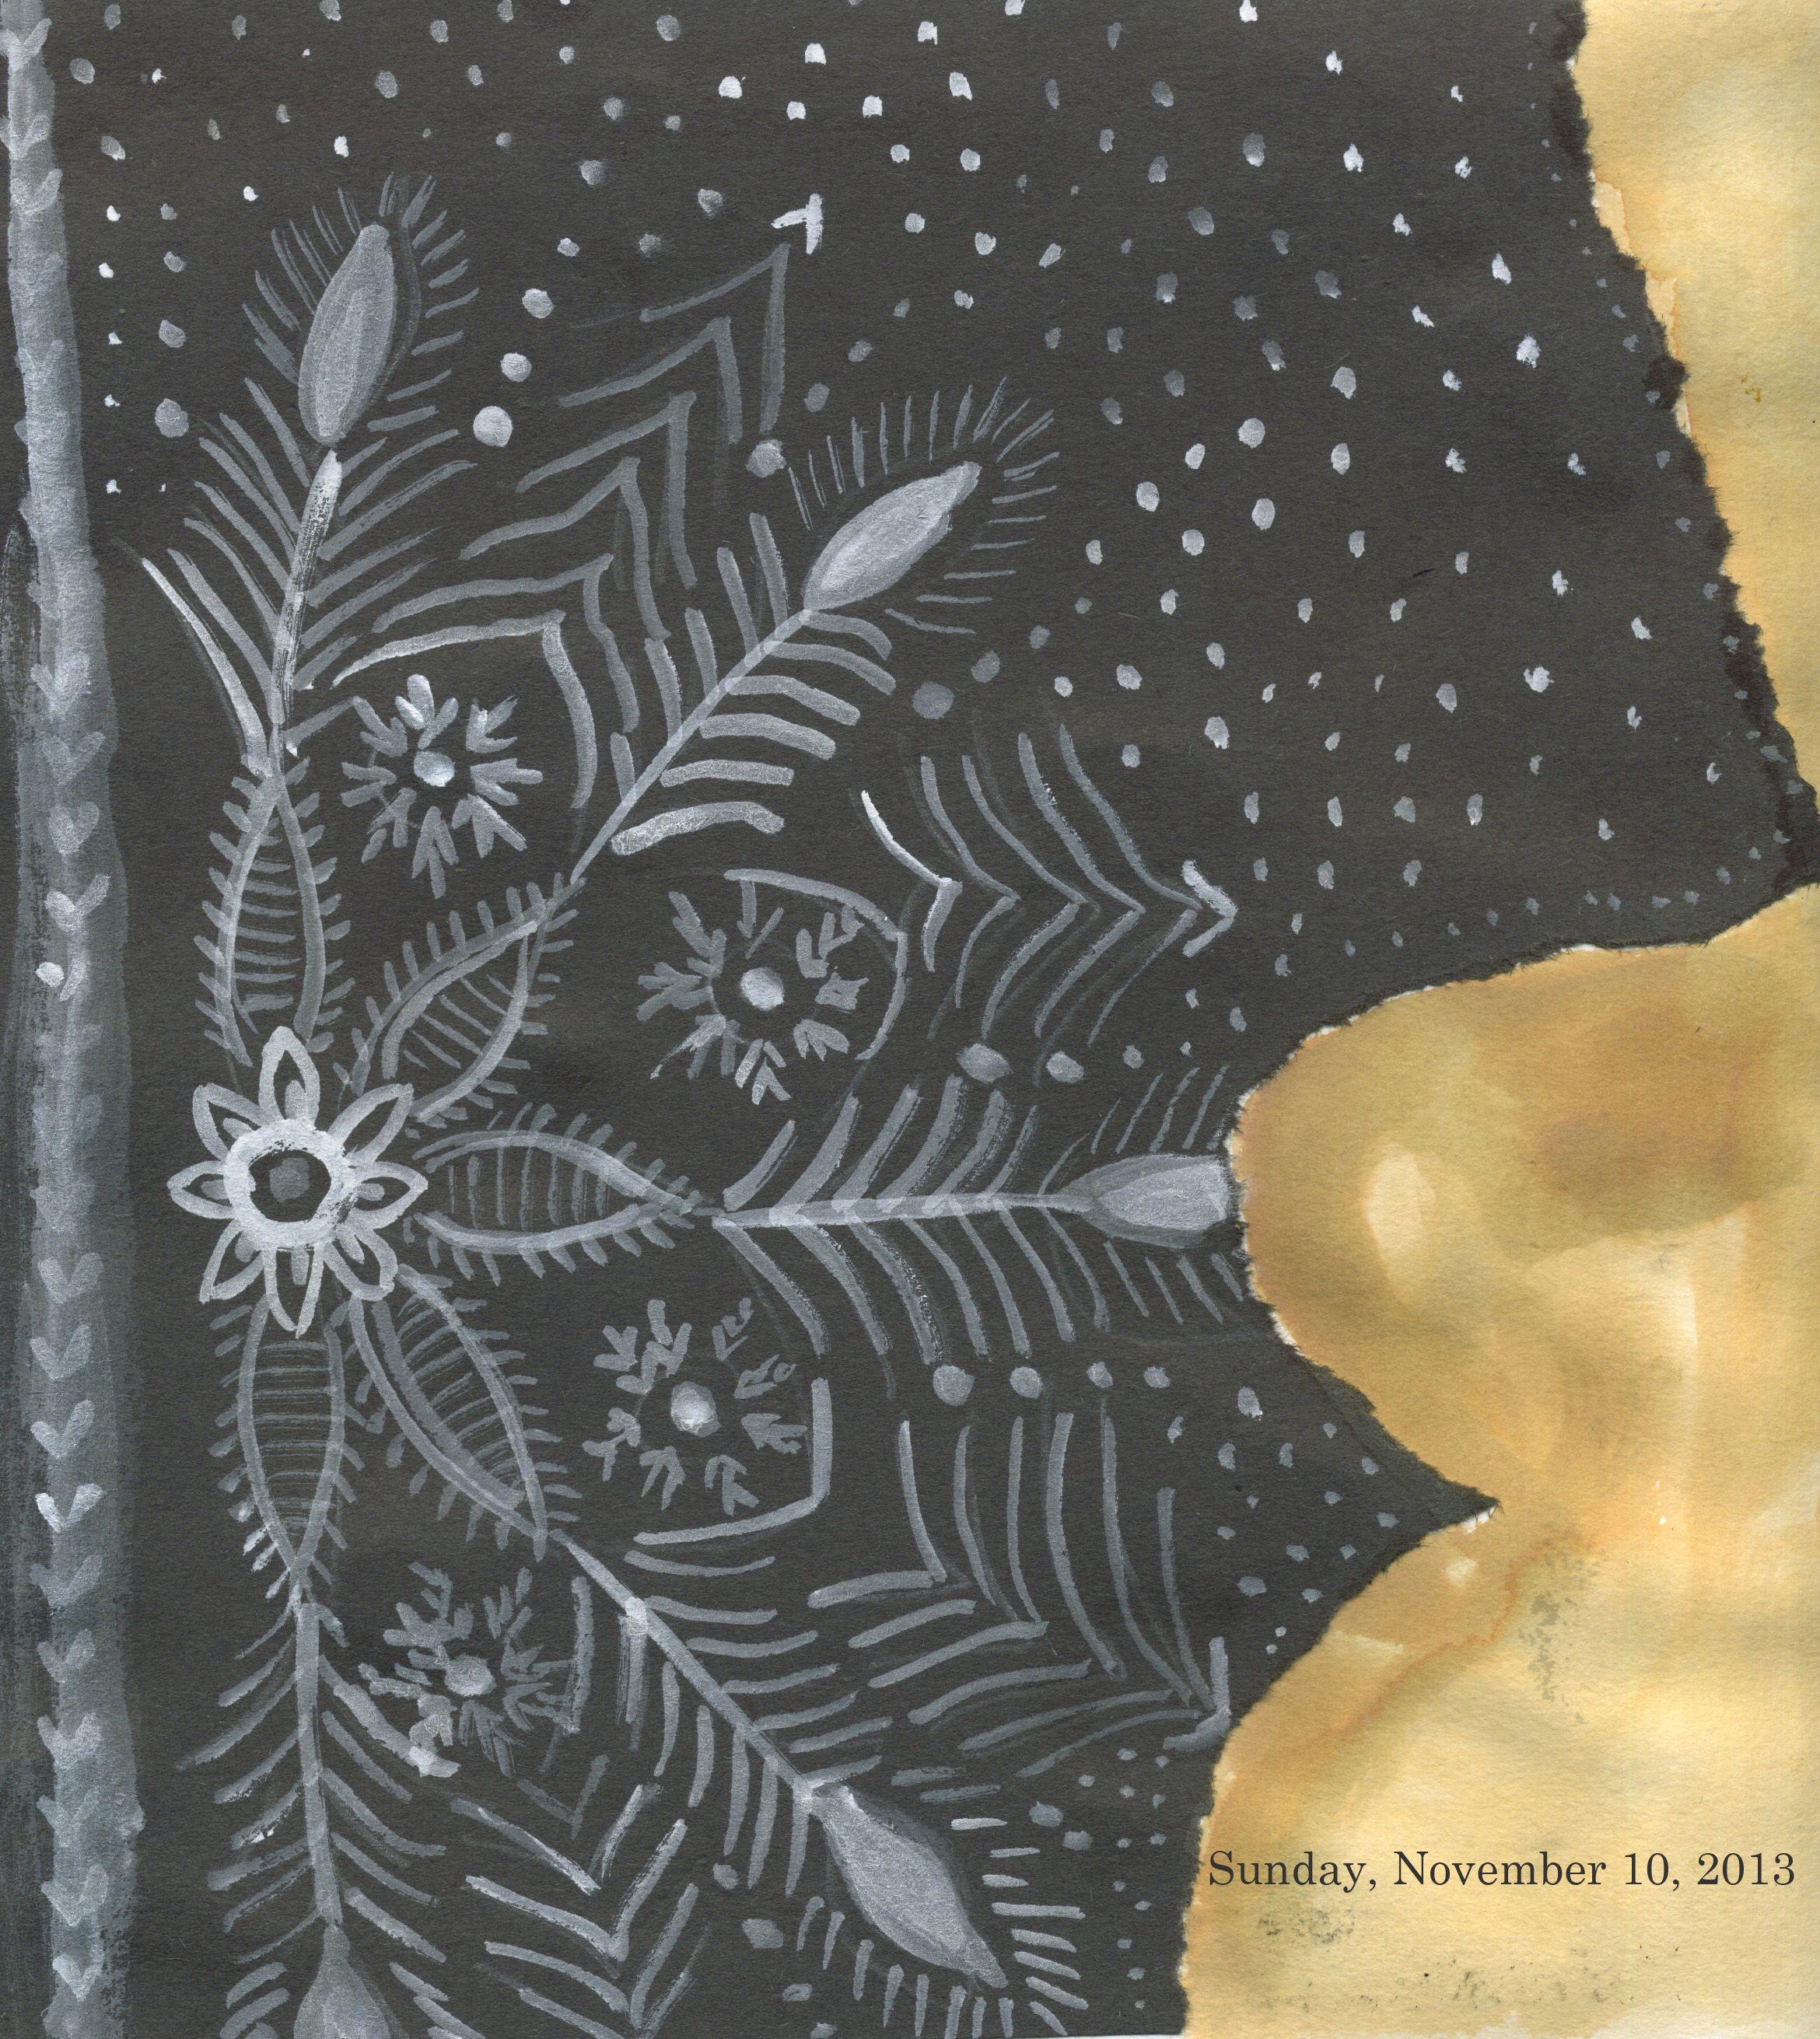 Julie Powell 11-10-13 | Art, Art journal, Illustration